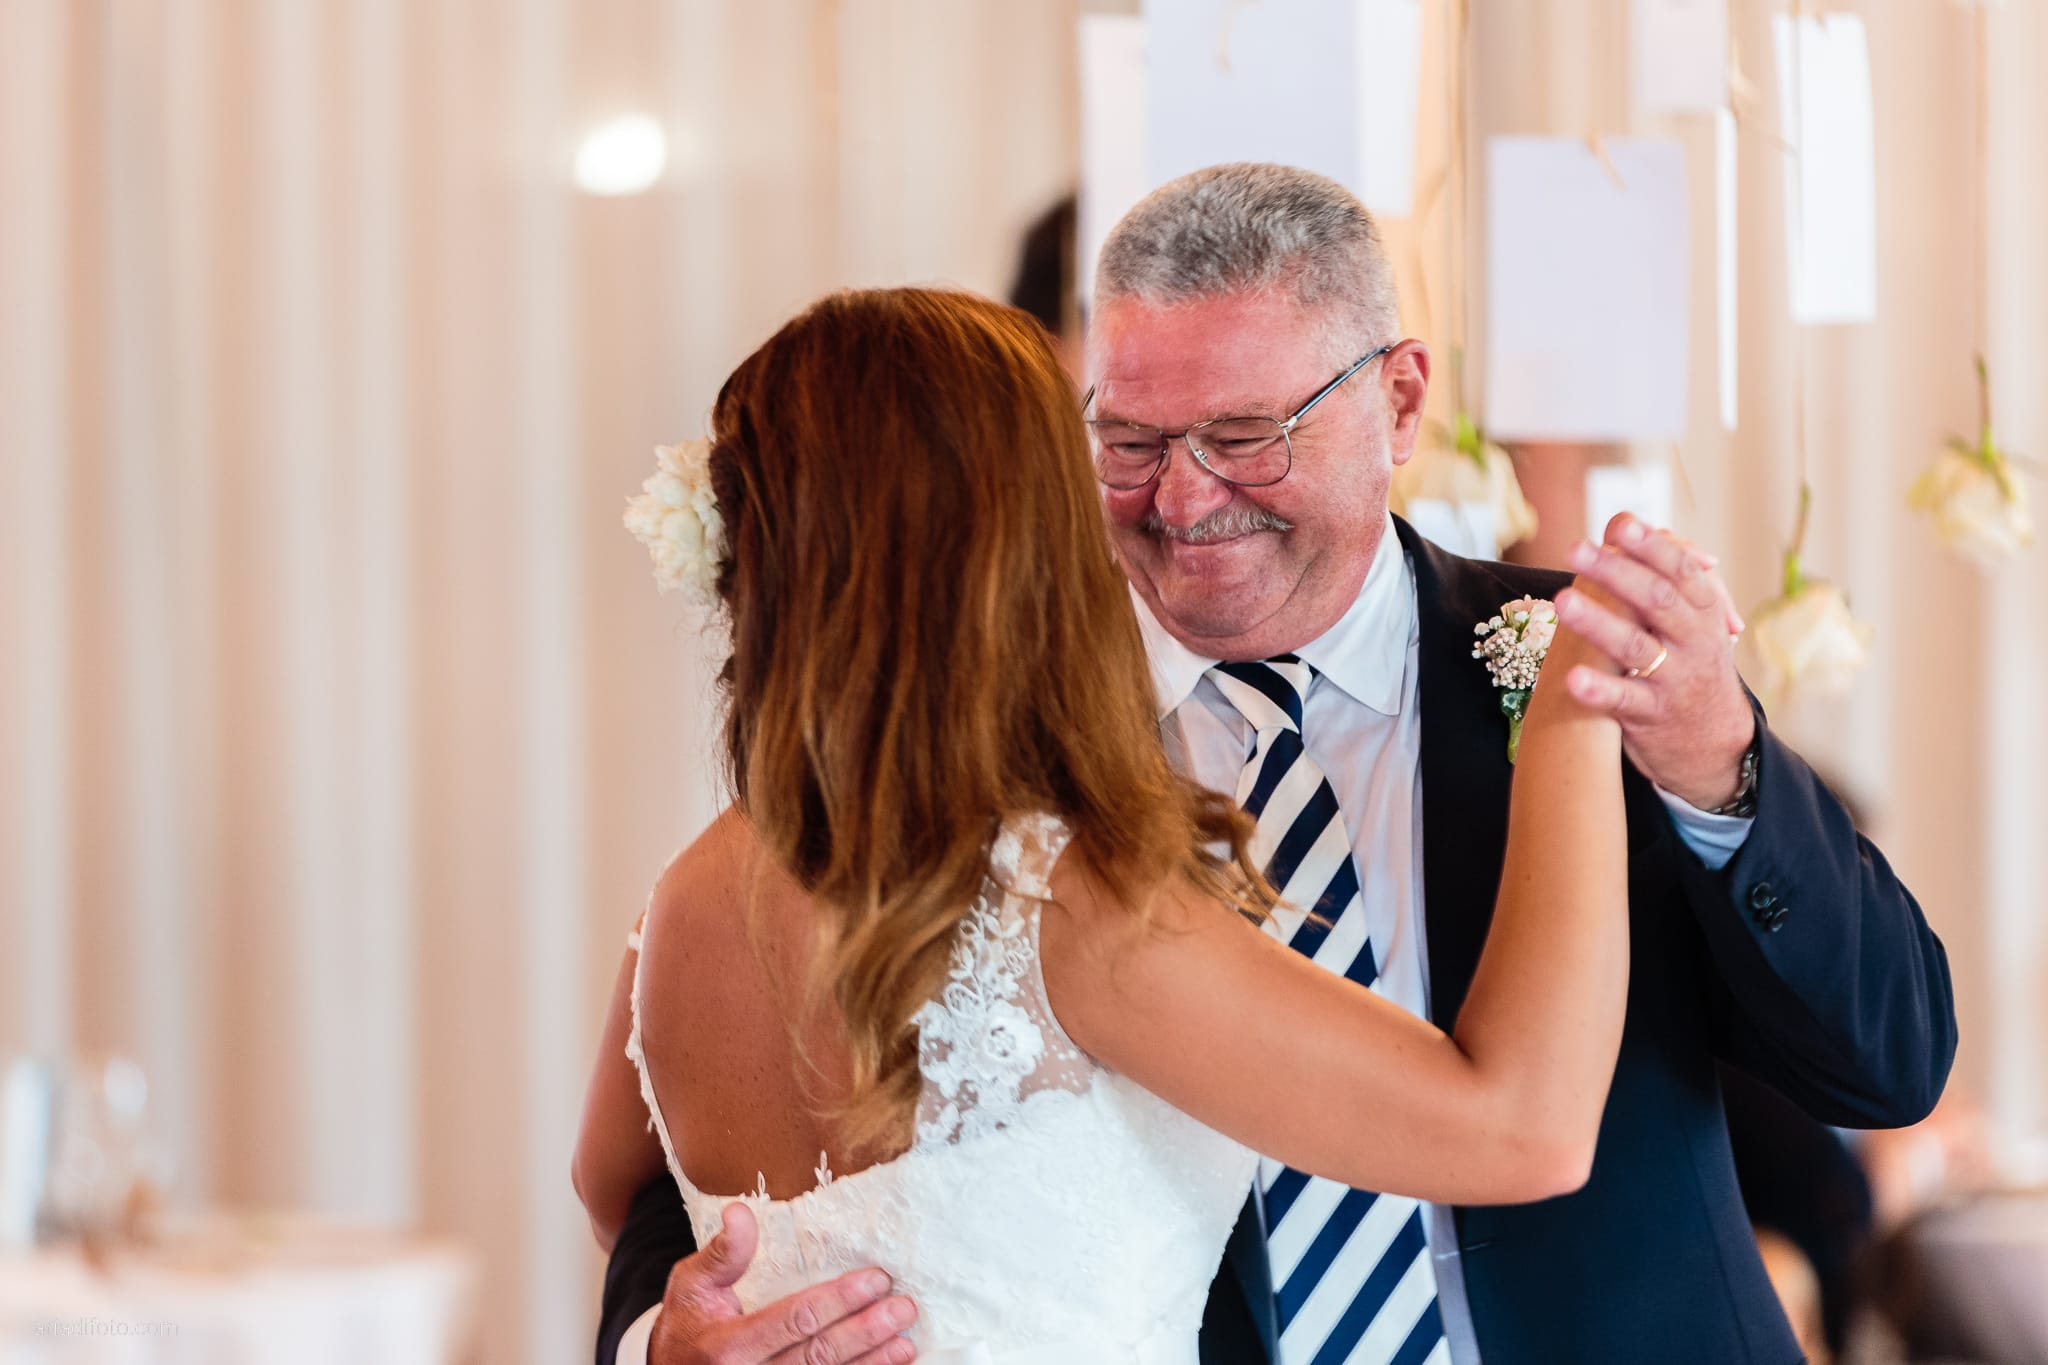 Giorgia Davide Matrimonio Villa Revoltella Salvia Rosmarino Trieste ricevimento primo ballo papà